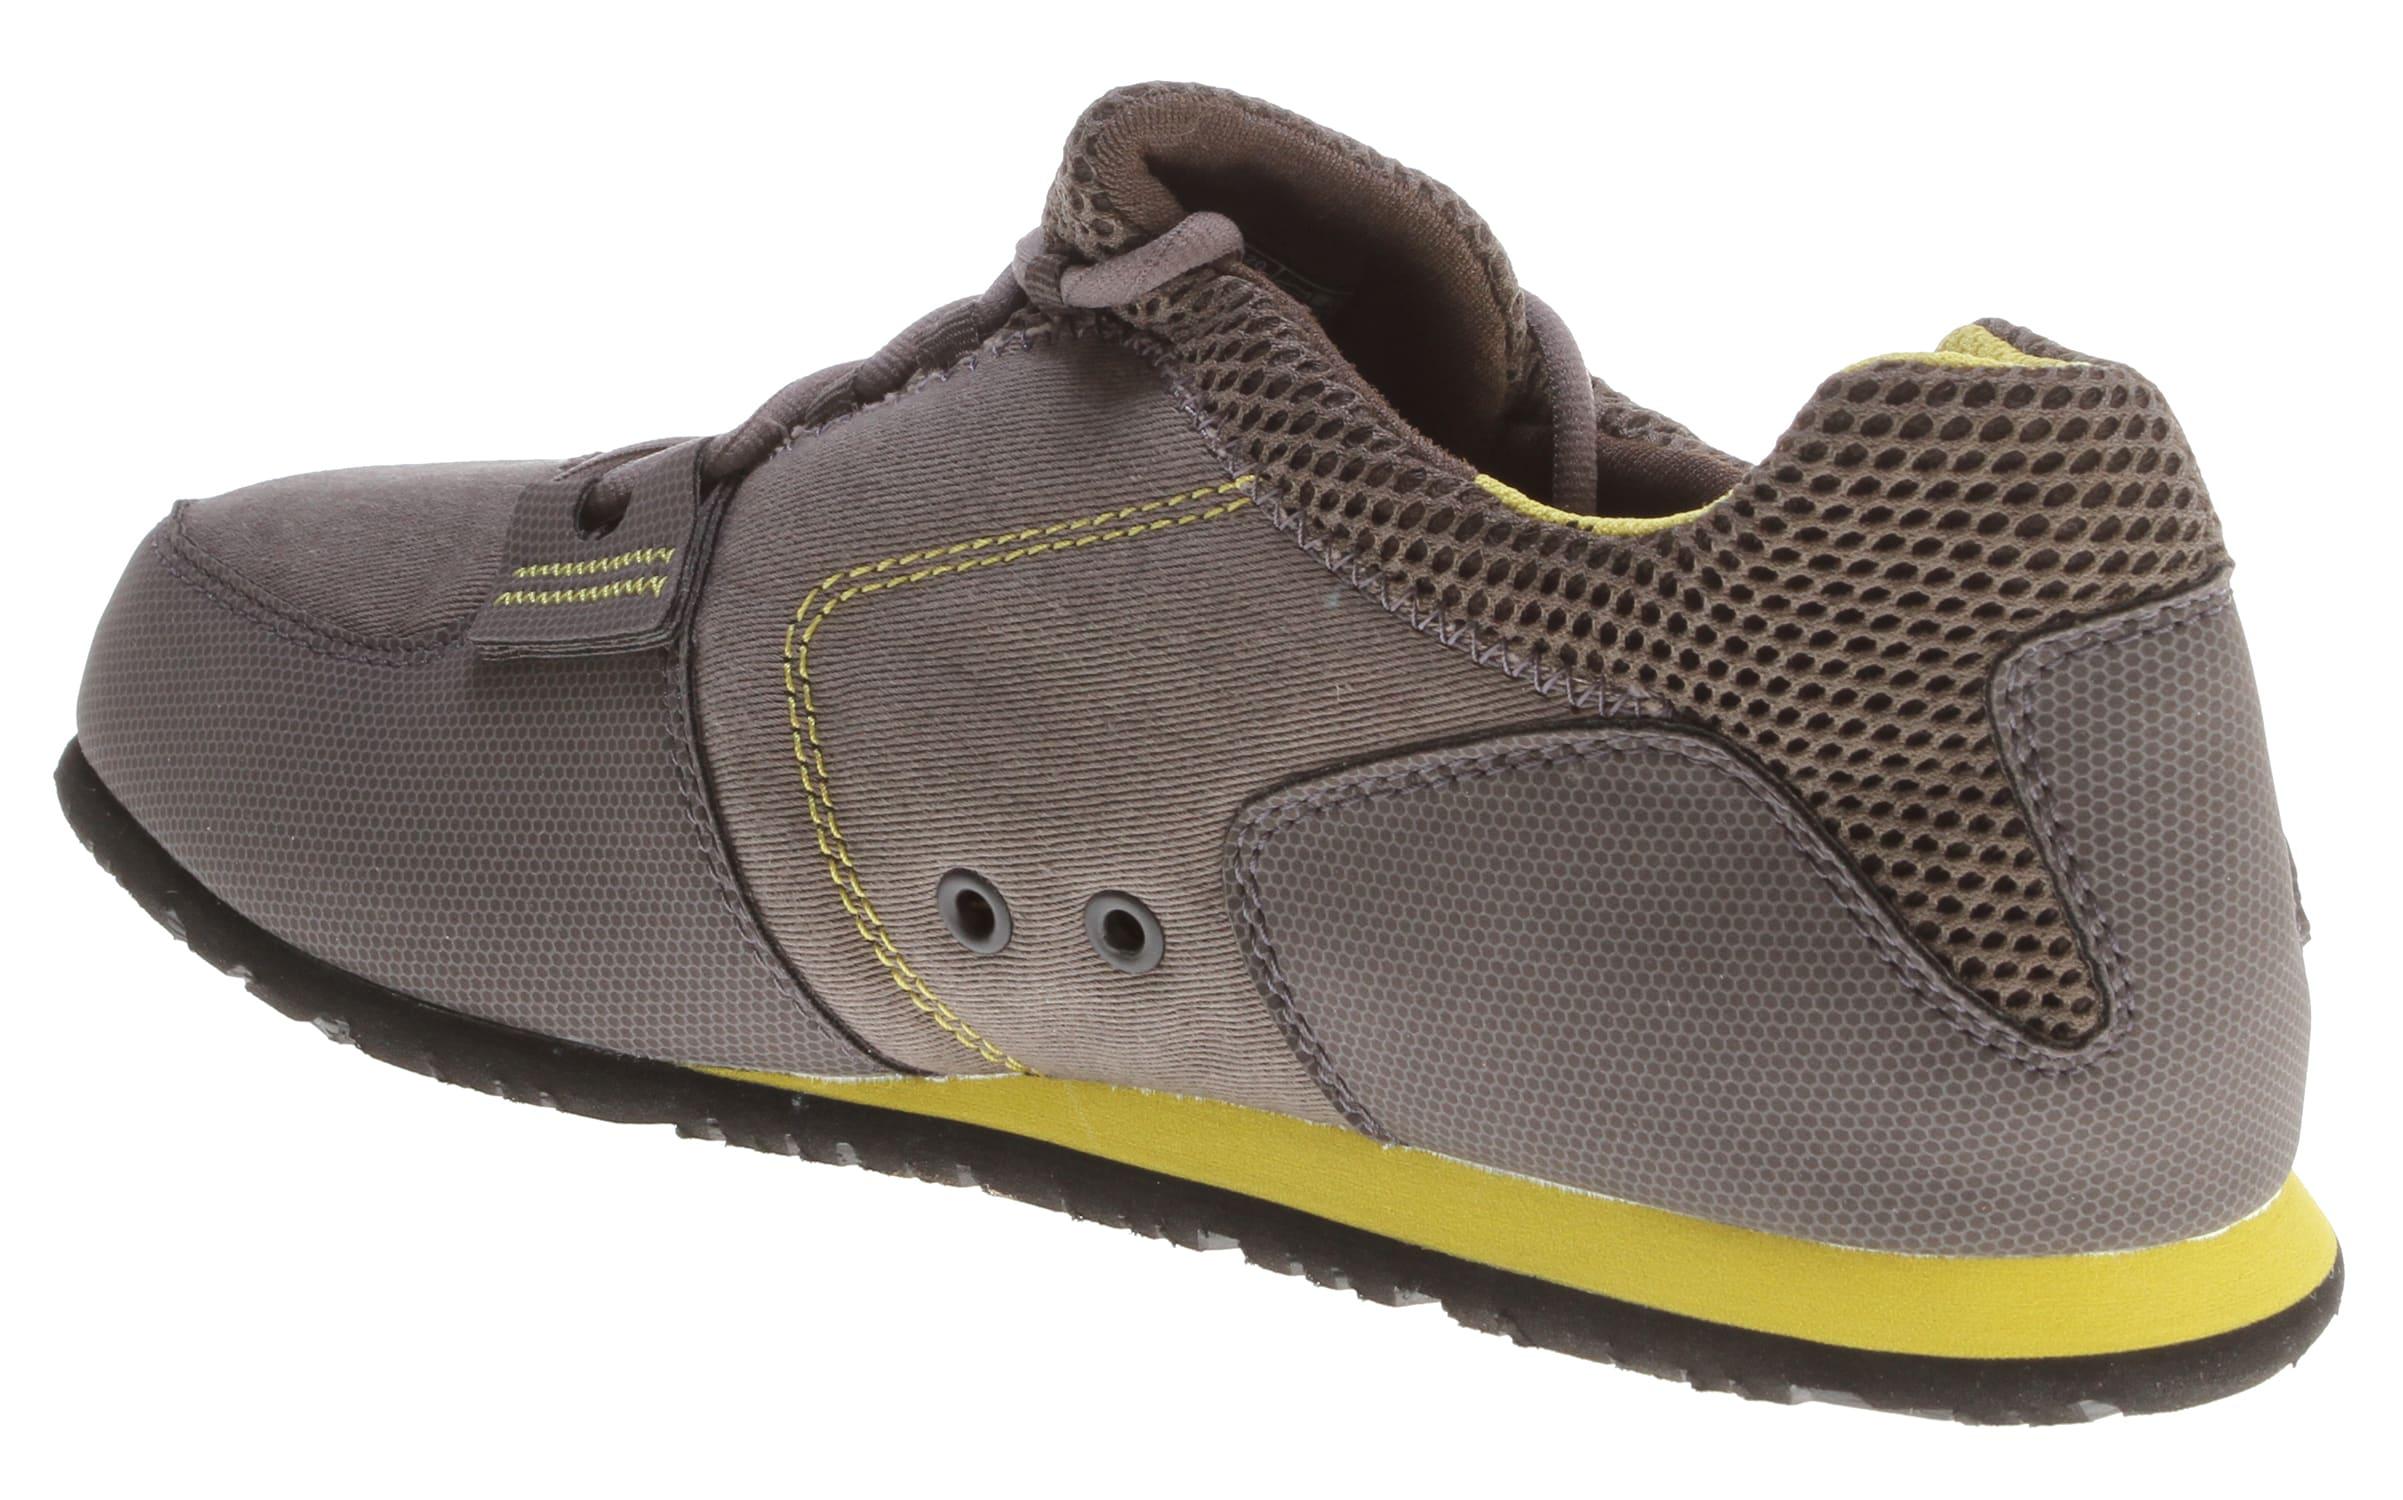 ddb41b98ff9a06 Teva Mush Frio Lace Canvas Shoes - thumbnail 3